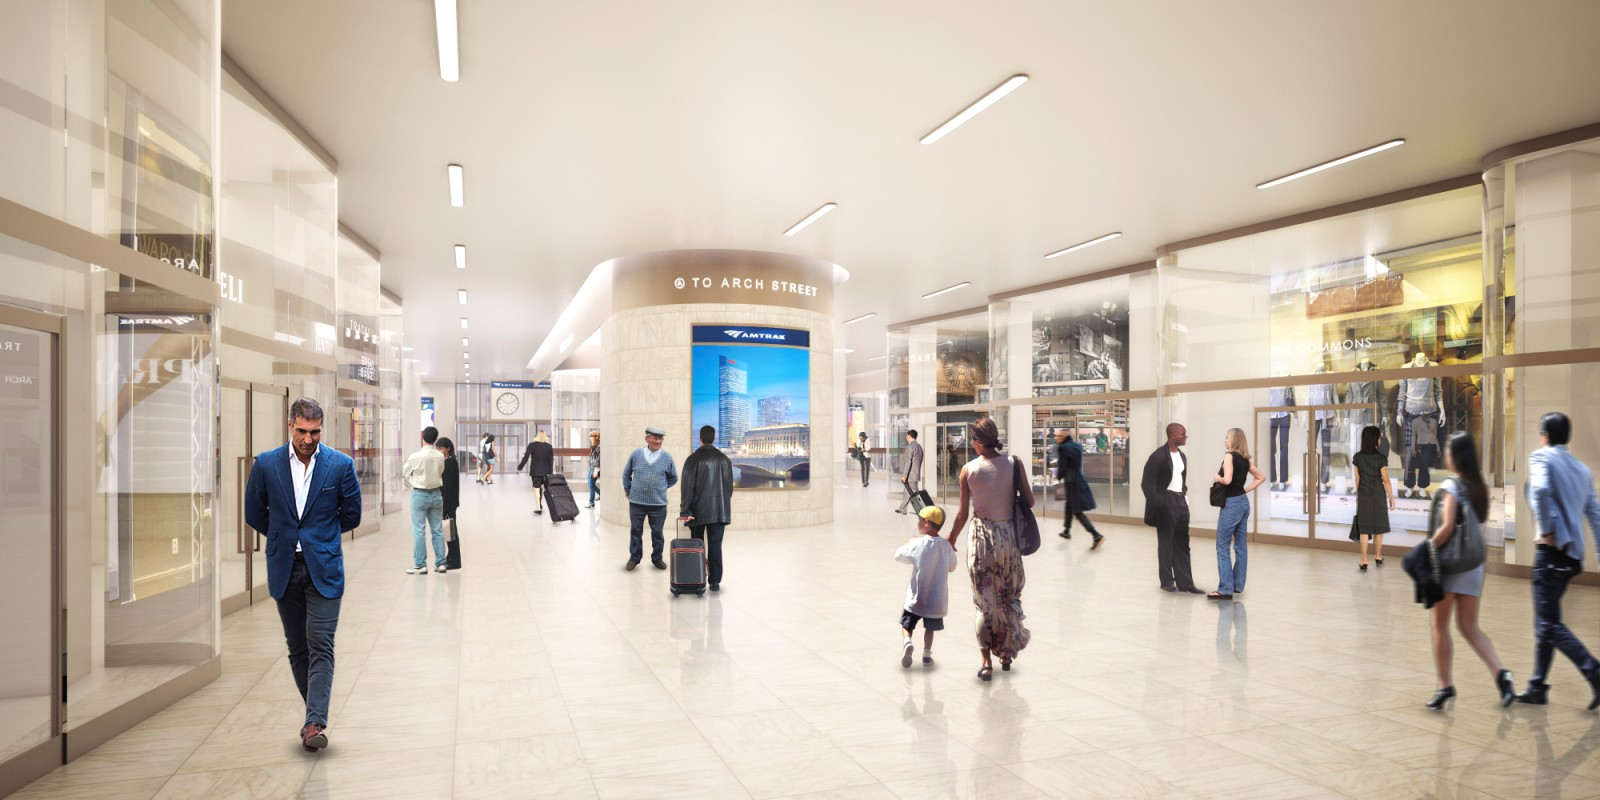 Philadelphia 30th Street Station Master Plan